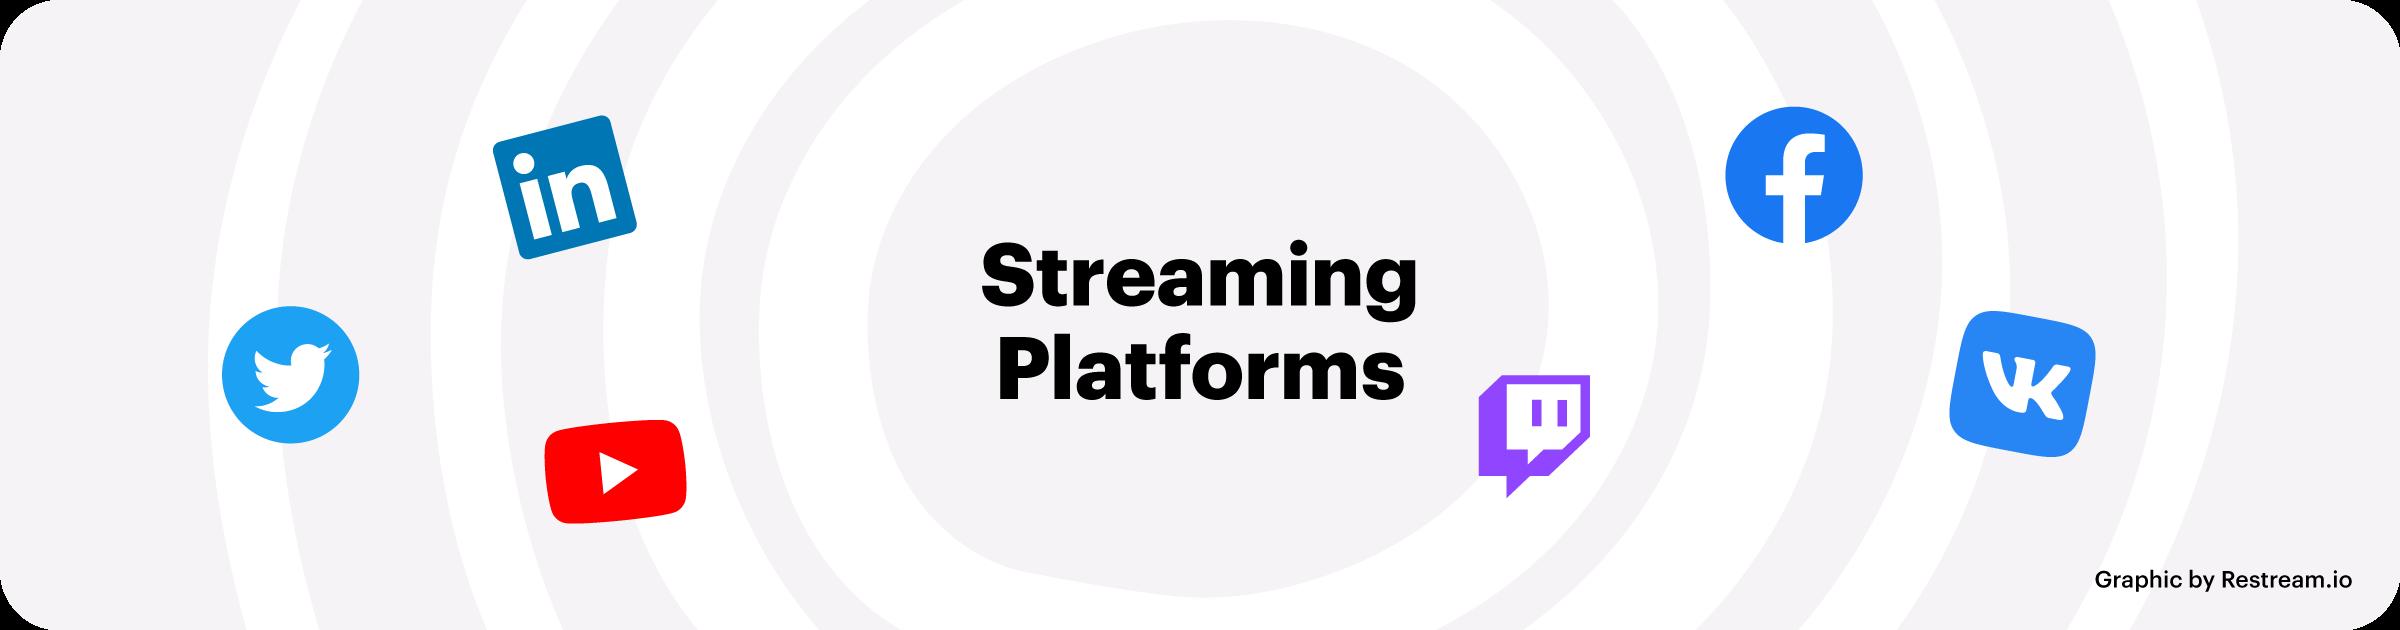 Popular live streaming platforms in 2020